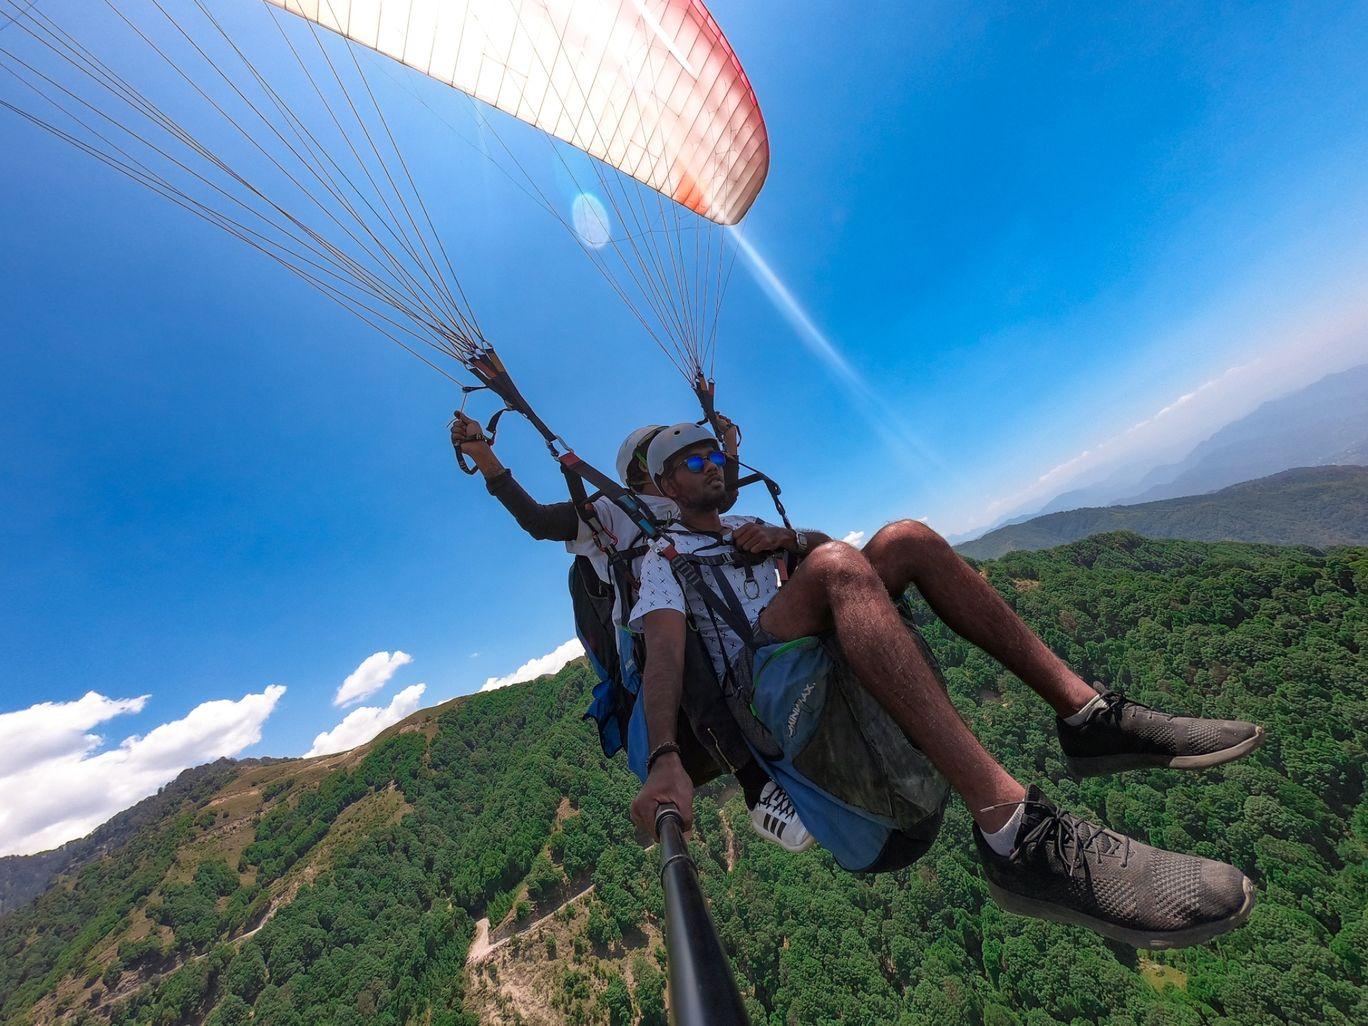 Photo of Bir Billing Paragliding By Darren Borges